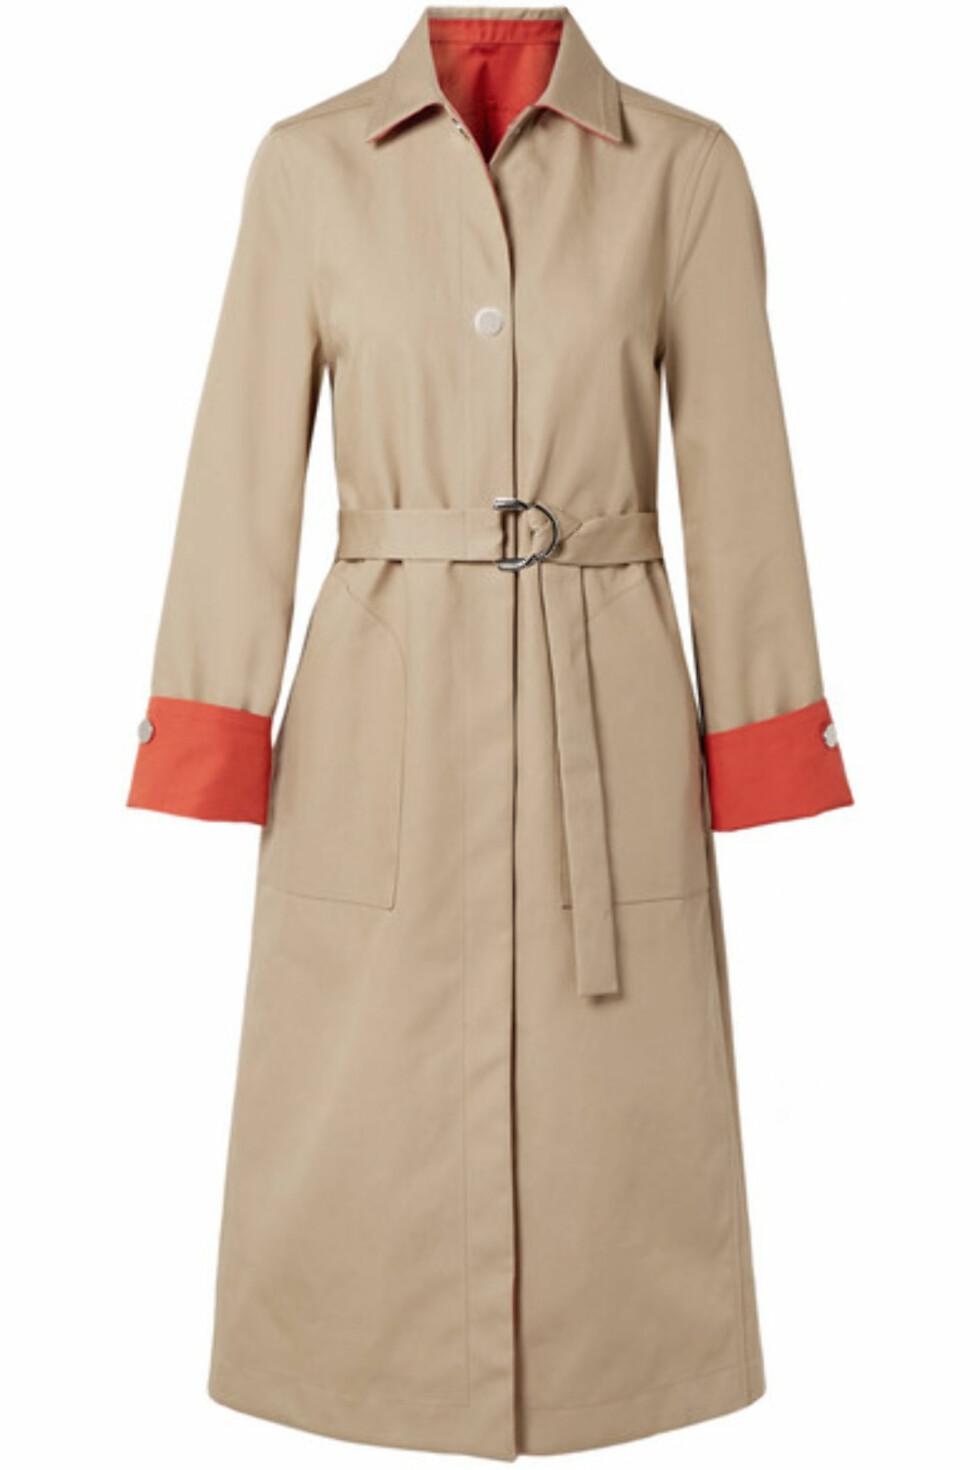 Trenchcoat fra Maje |5100,-| https://www.net-a-porter.com/no/en/product/1047820/Maje/reversible-two-tone-cotton-gabardine-trench-coat